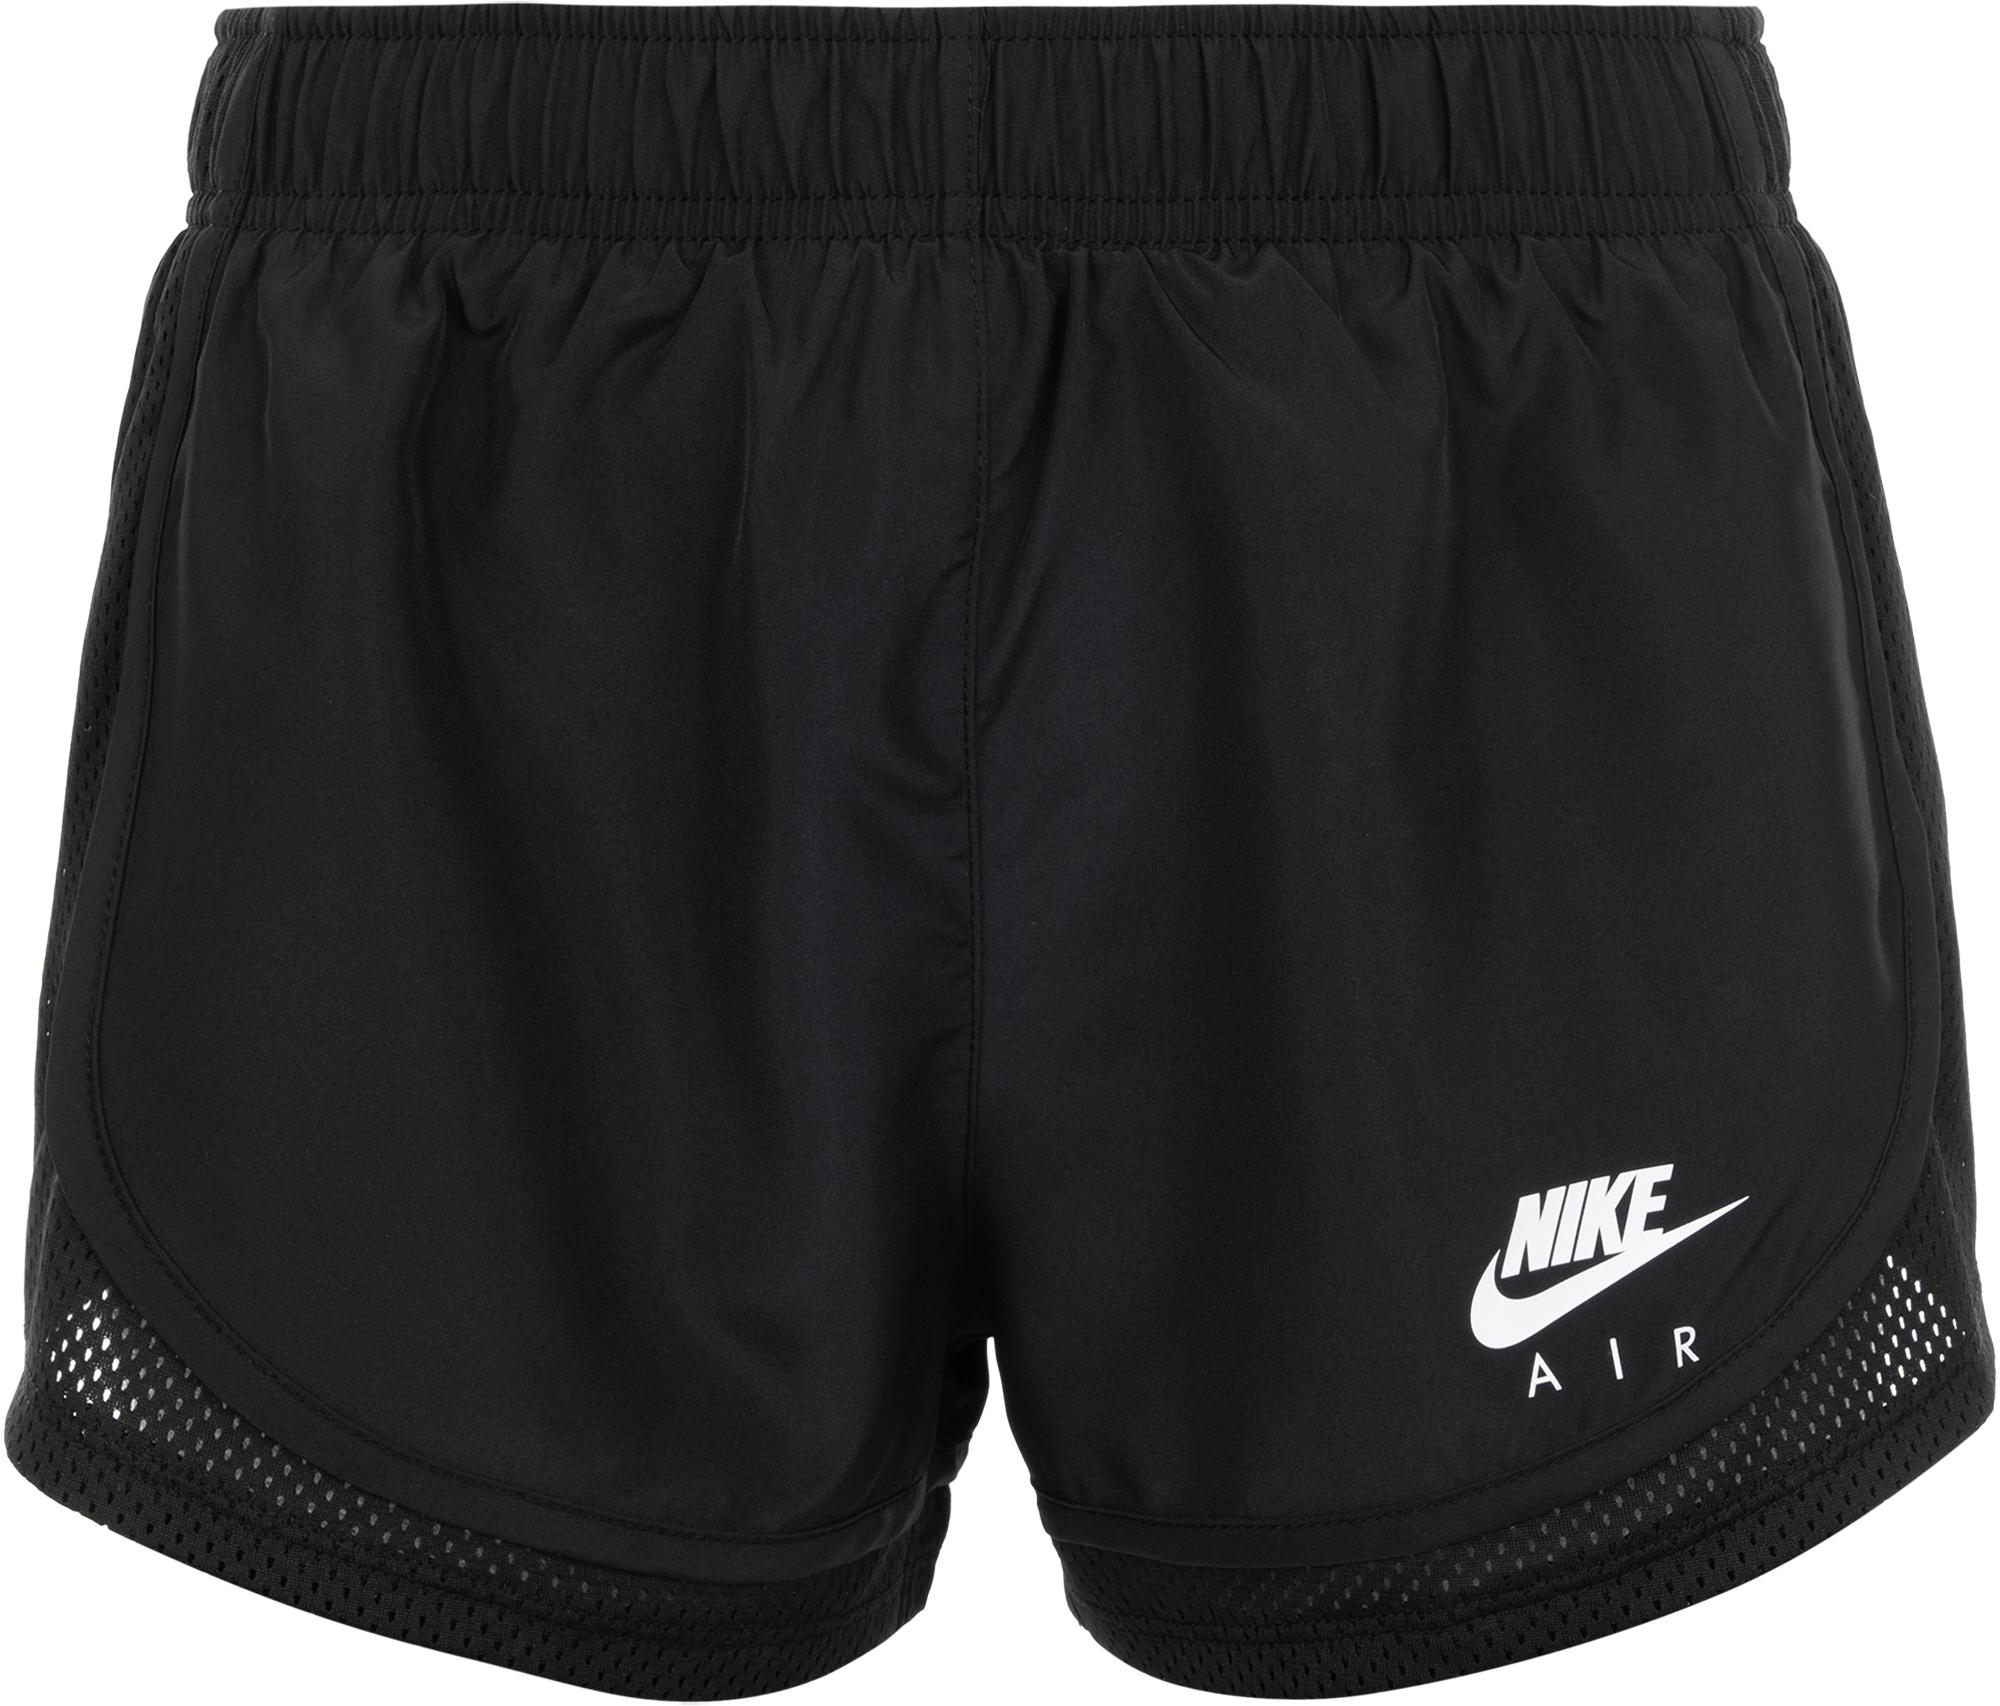 Nike Шорты женские Nike Air Tempo, размер 40-42 цены онлайн